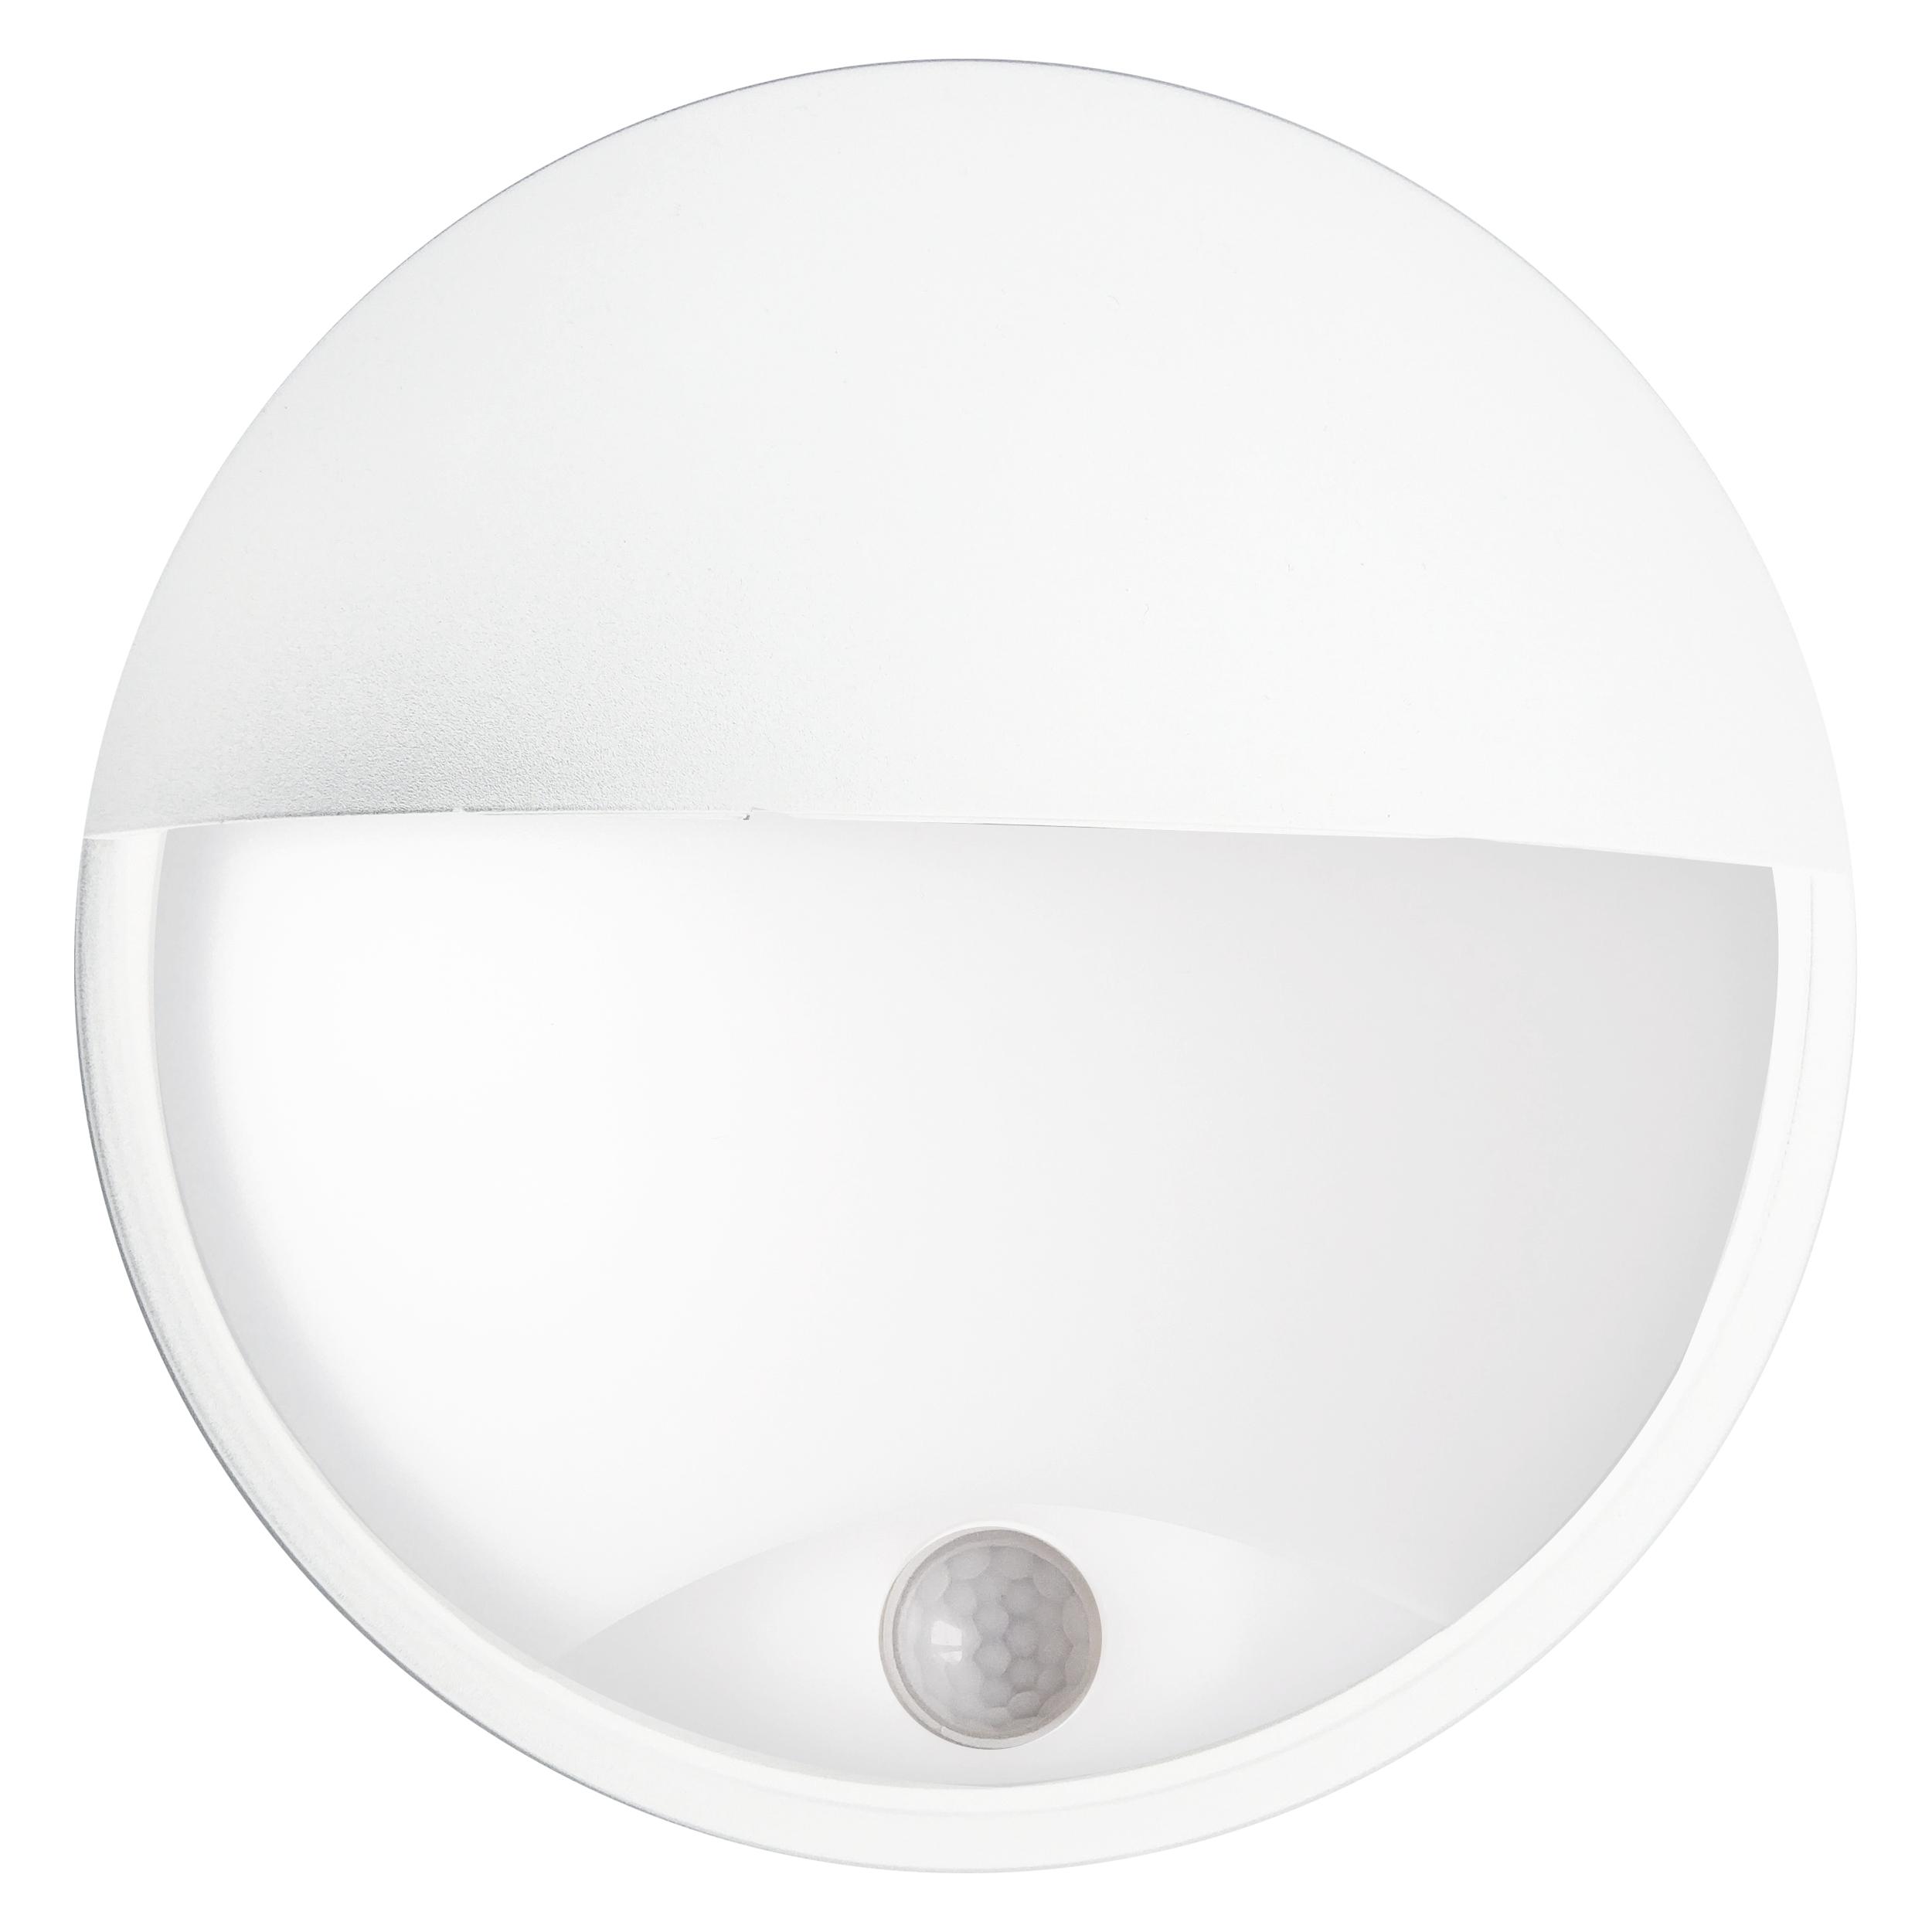 LED přisazené senzorové svítidlo DITA ROUND W 14W NW cover Greenlux (GXPS045)